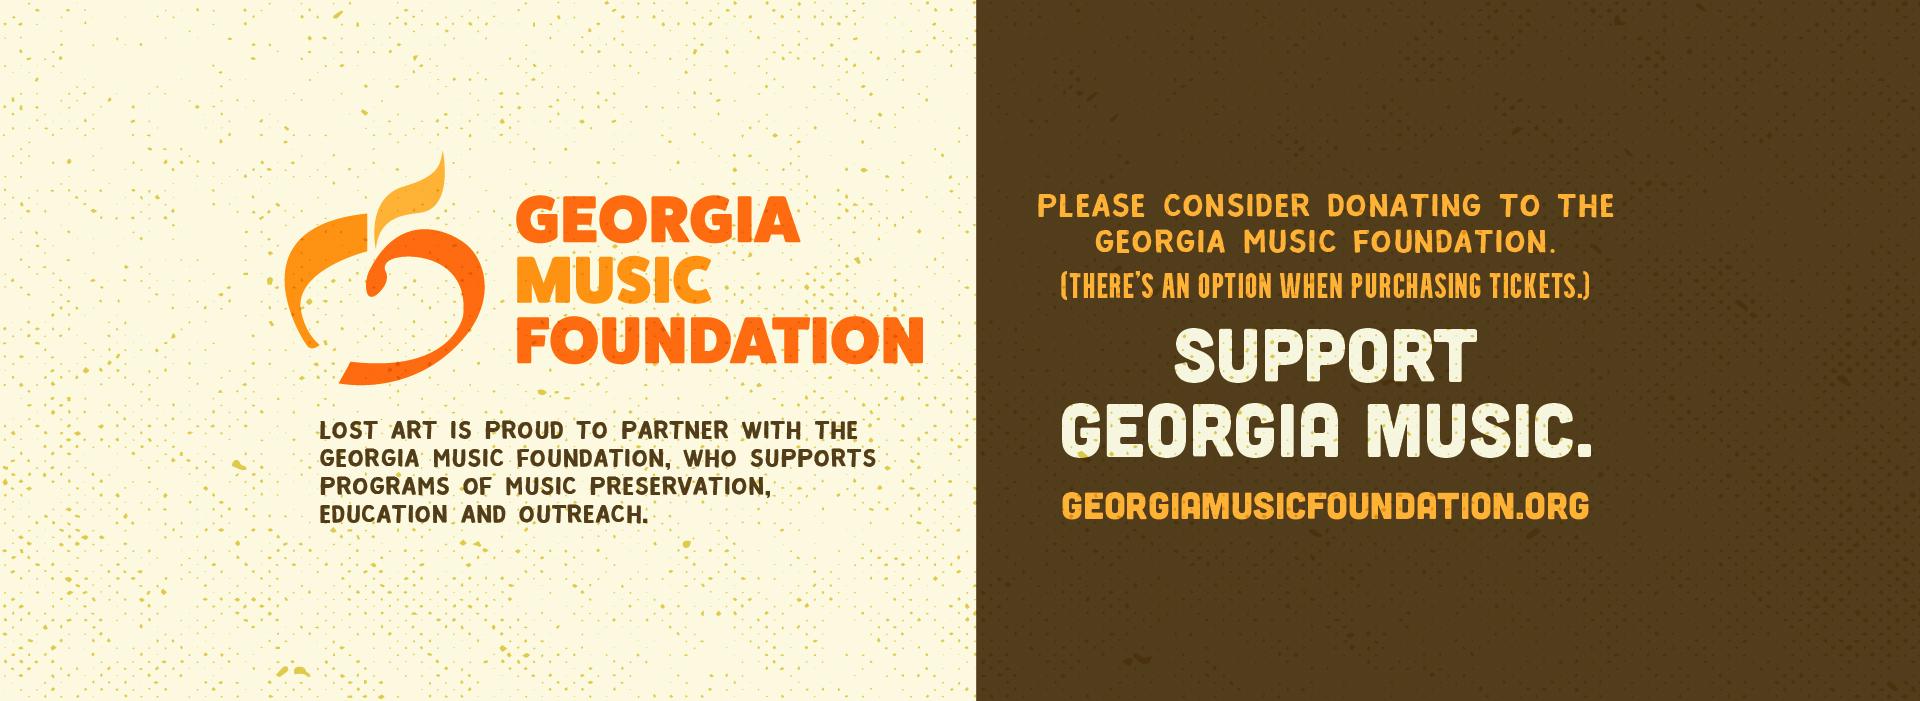 Georgia Music Foundation